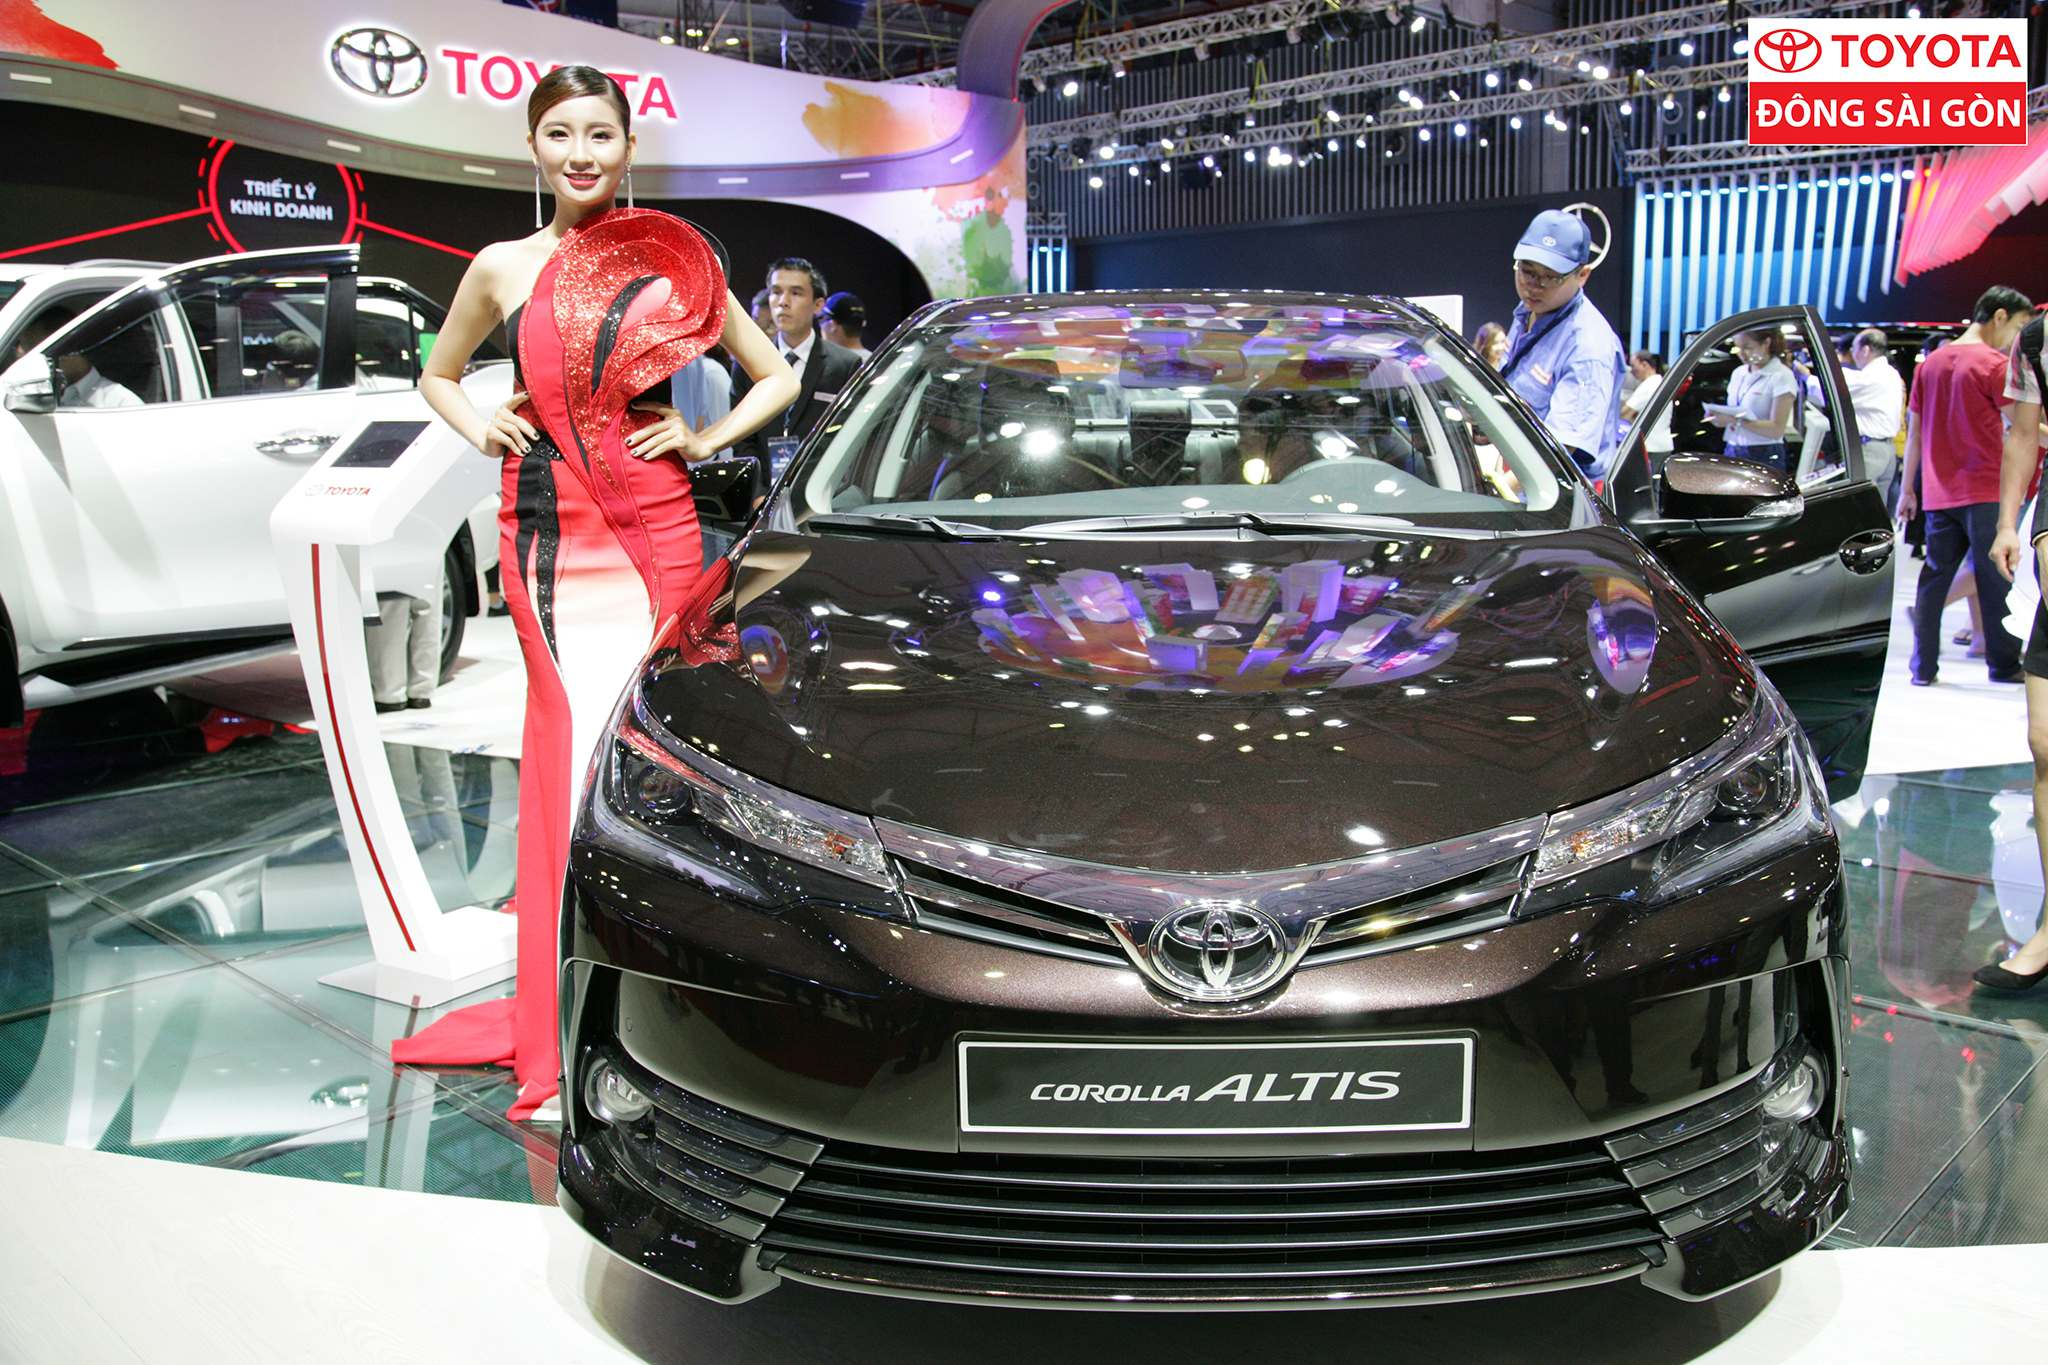 vietnam motor show 20173 Toyota at Vietnam Motor Show 2017